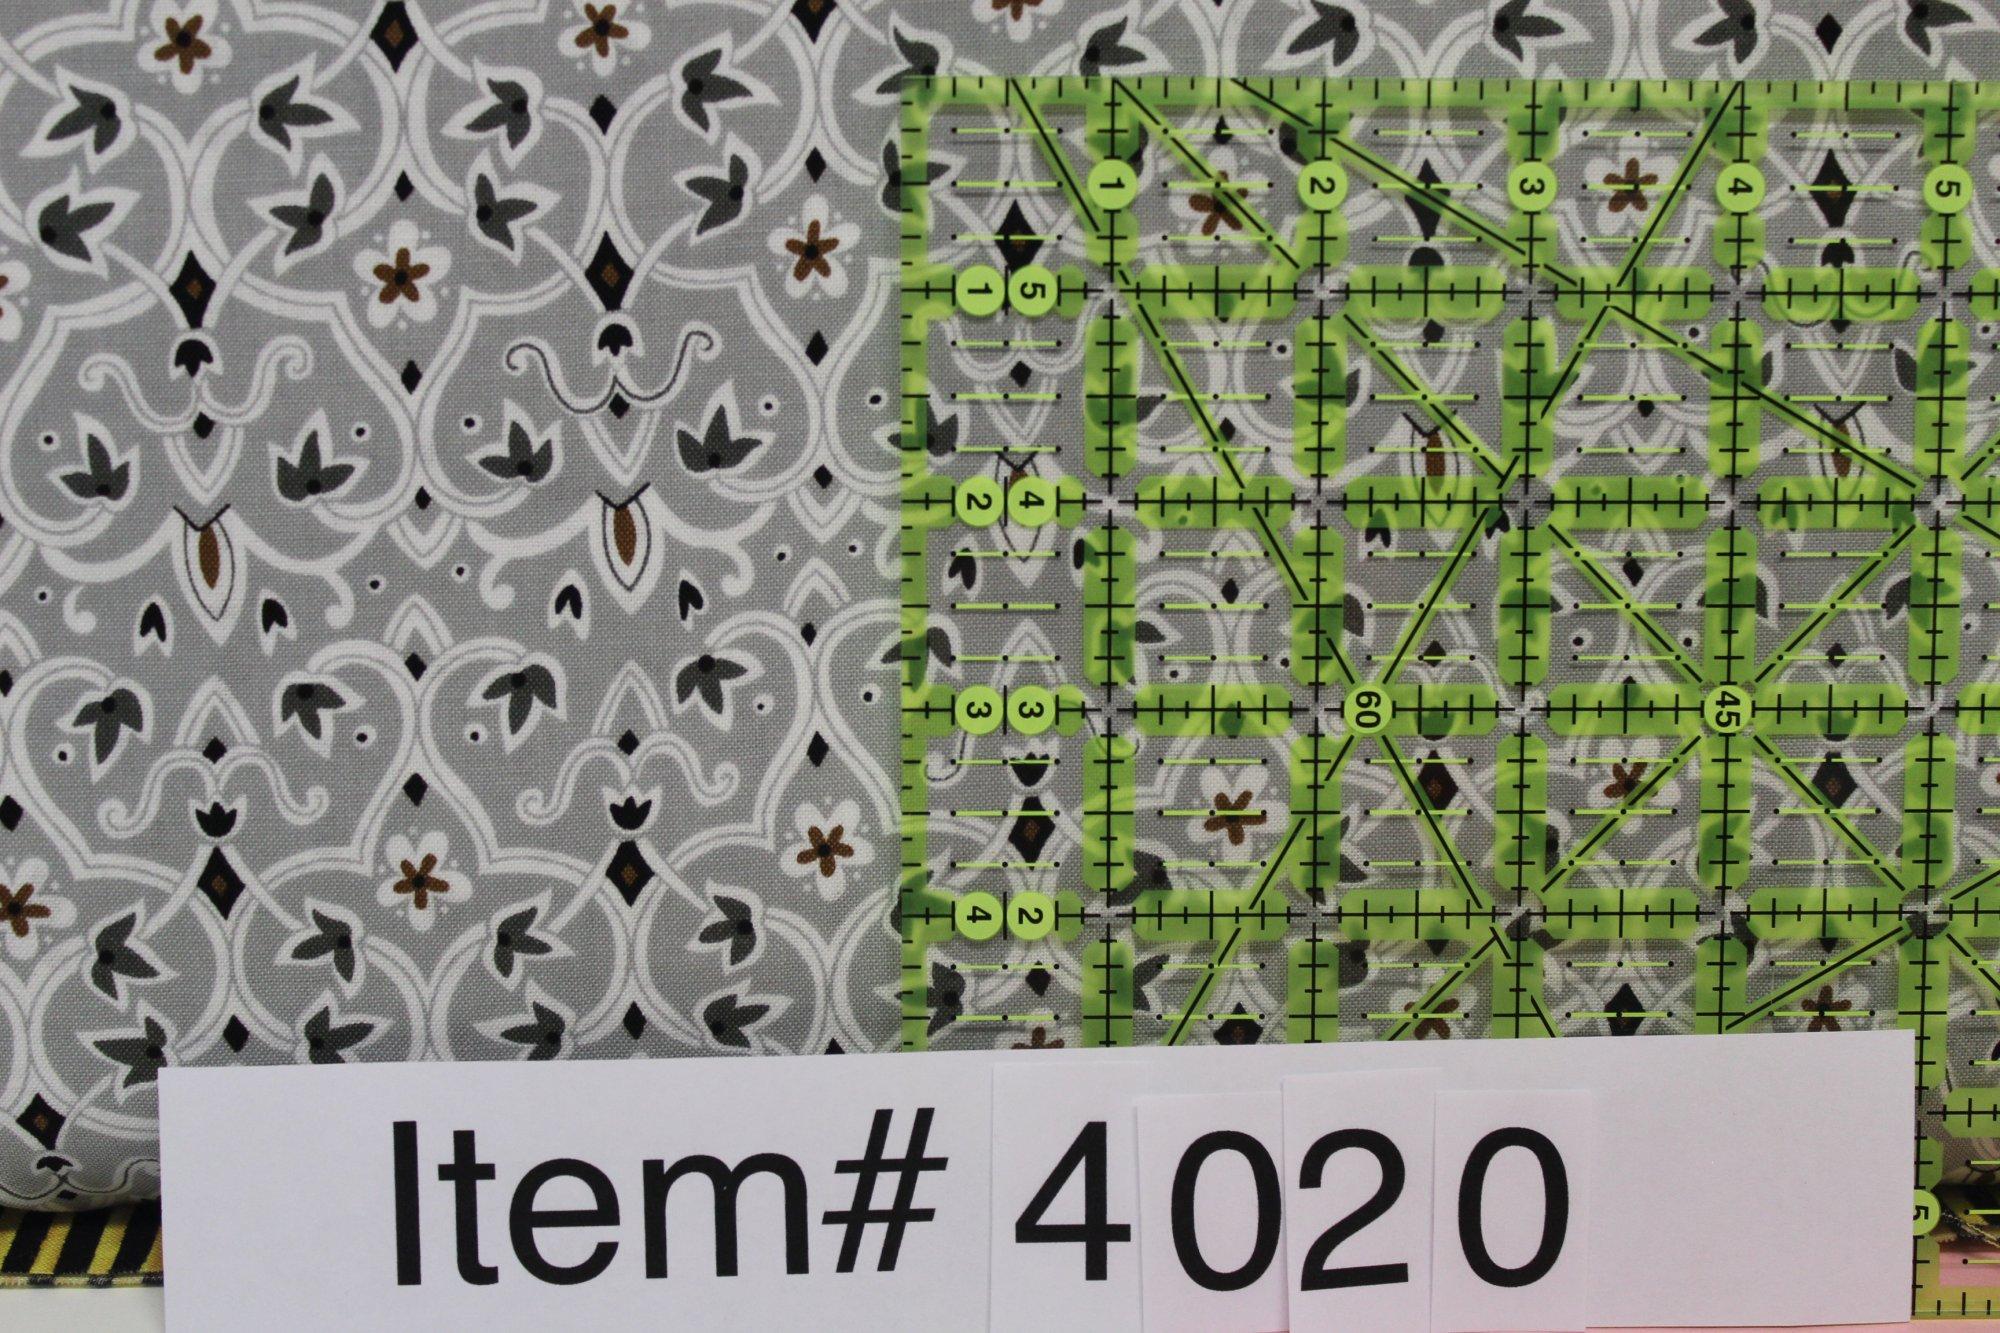 Item#4020 - Mini Bolt (3 Yard Cut) - Paloma - Blank - Bolt 4020